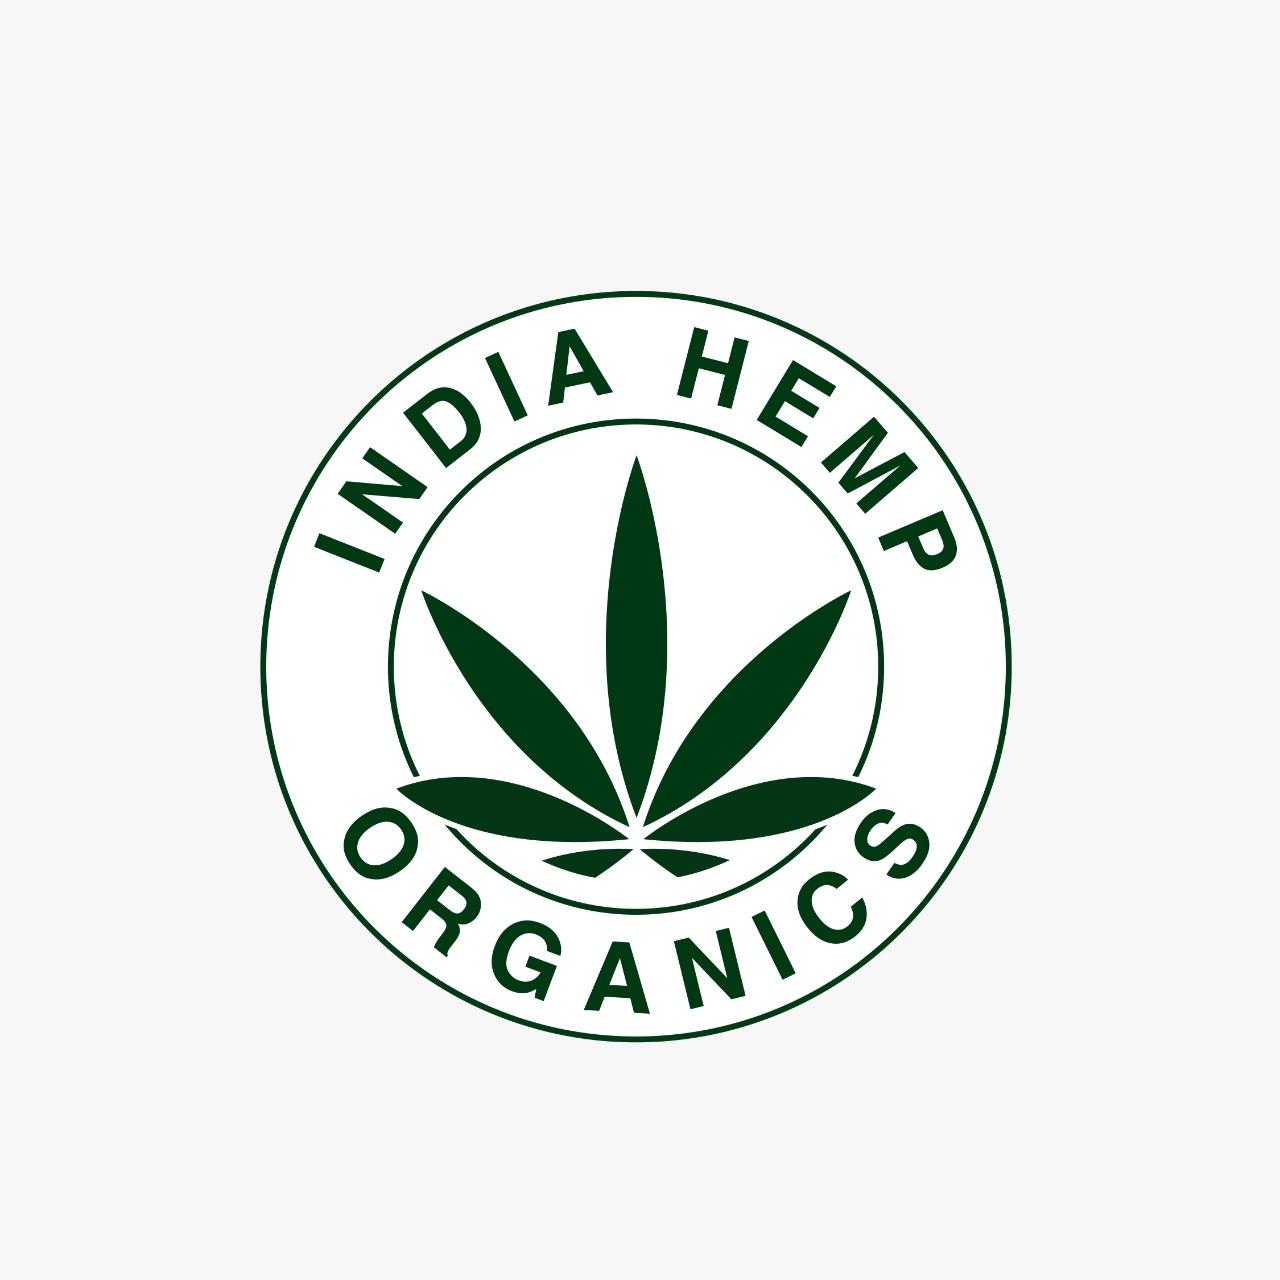 CBD Brand - India Hemp Organics Logo